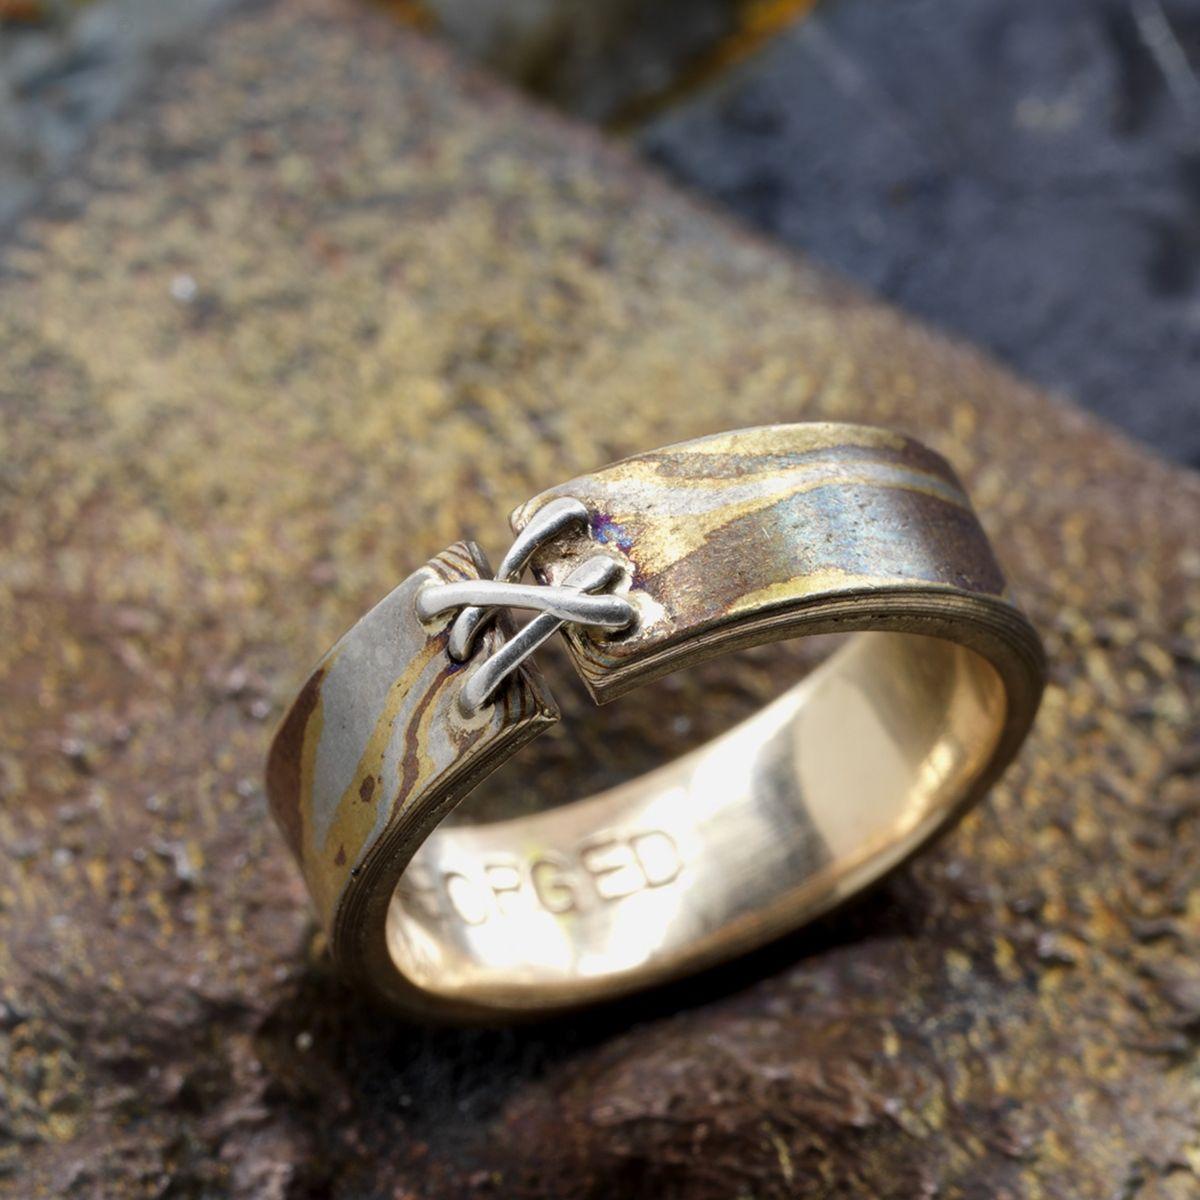 Divorce Ring | Rings, Unique rings, Rings for men